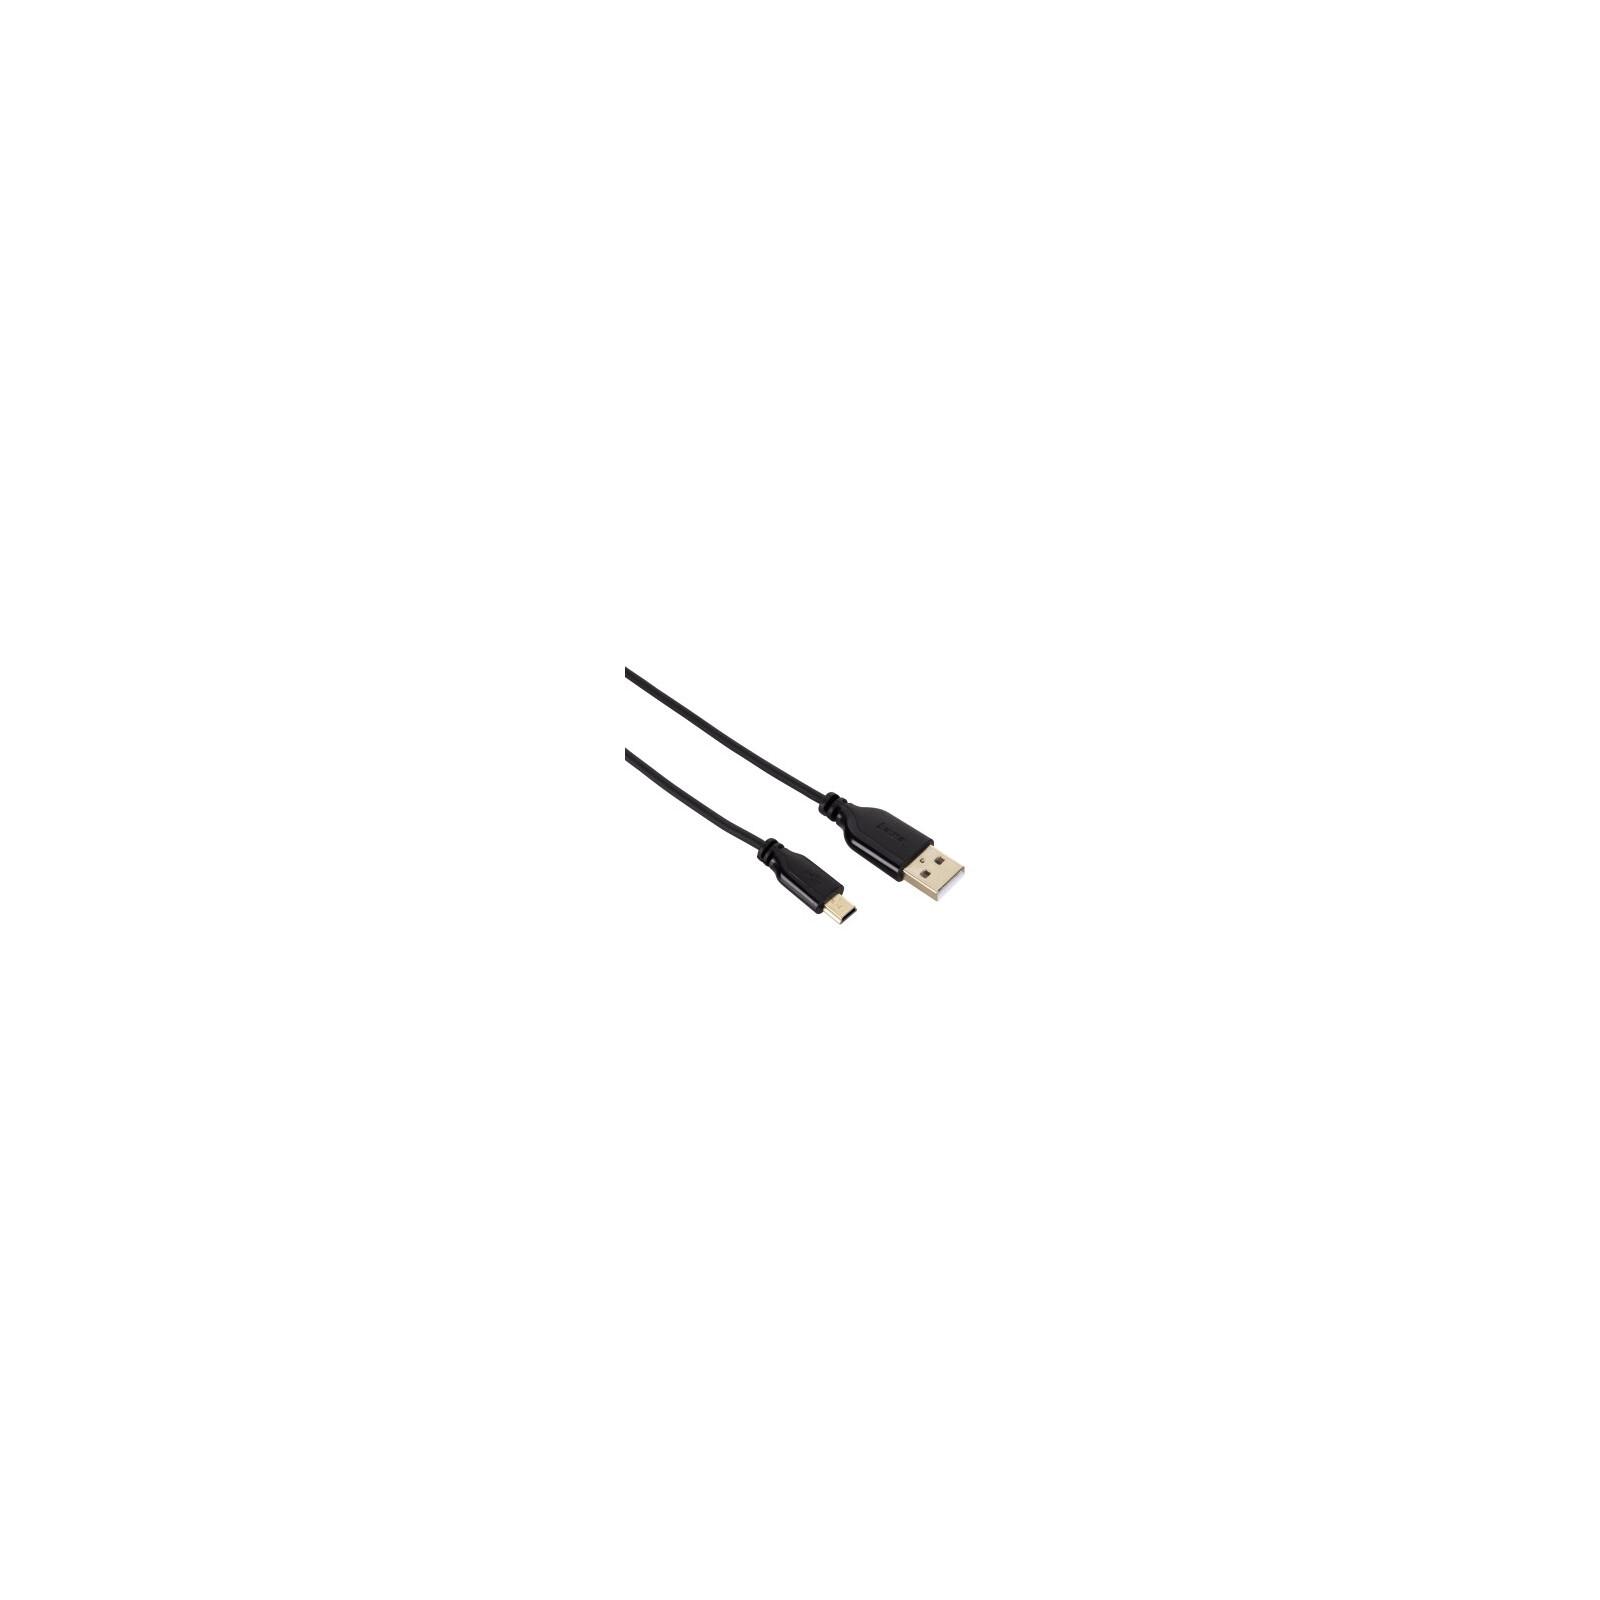 Hama USB 2.0 Anschlusskabel A-Stecker-Mini-B-St.